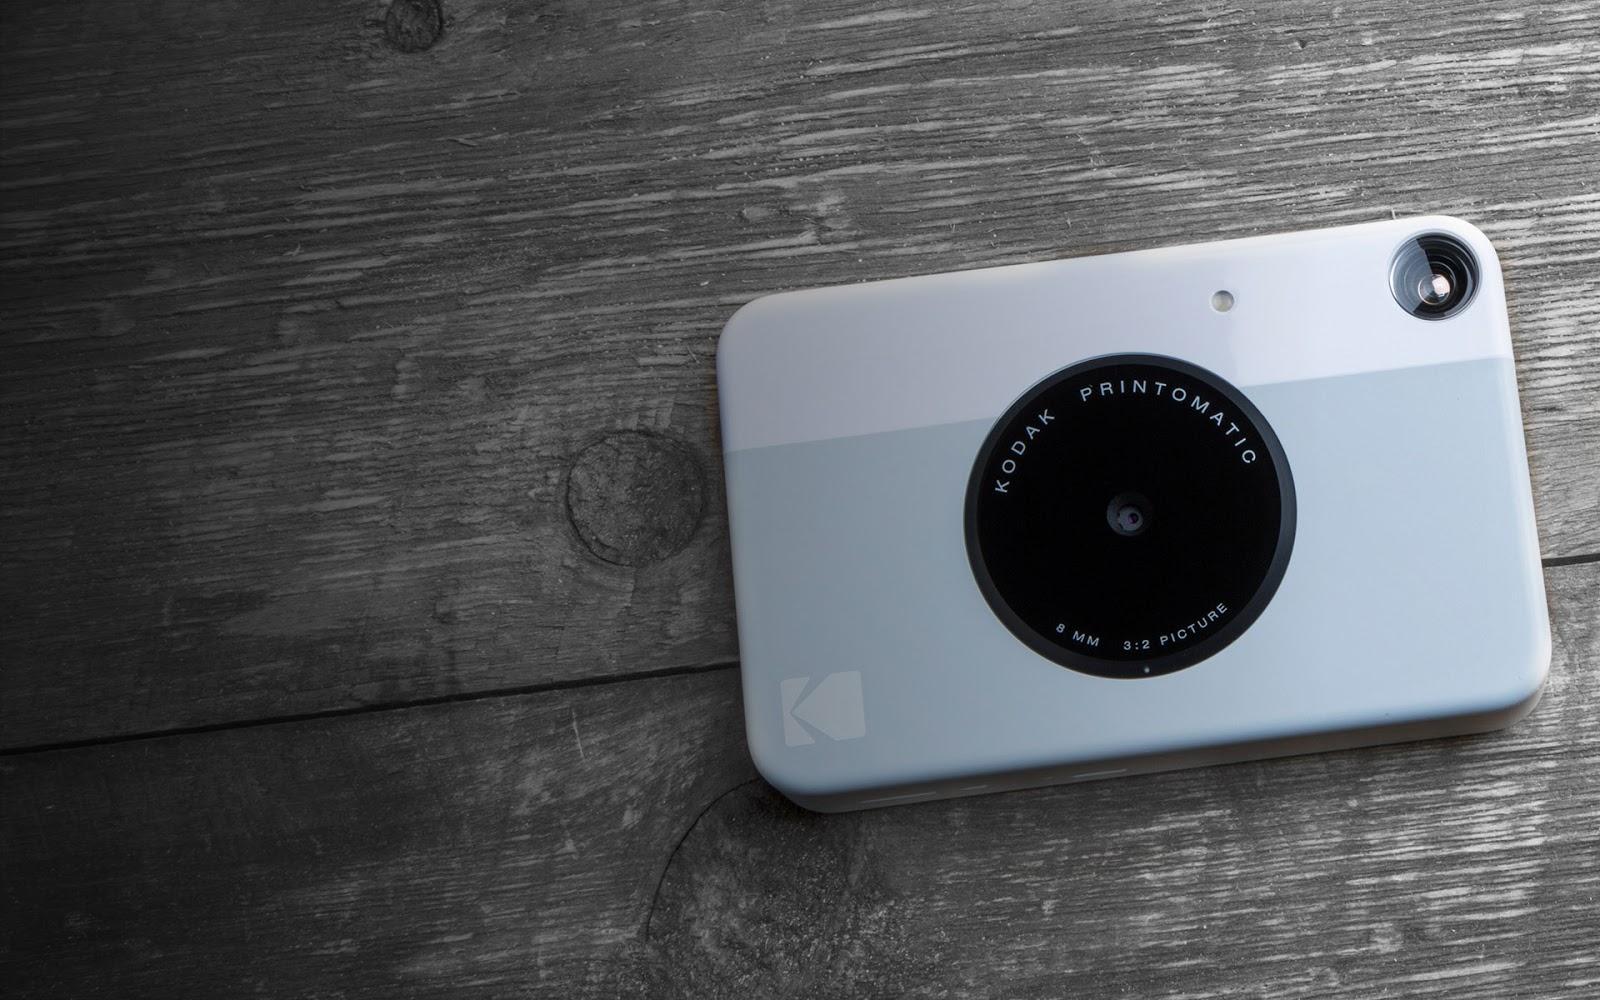 Kodak Printomatic серого цвета